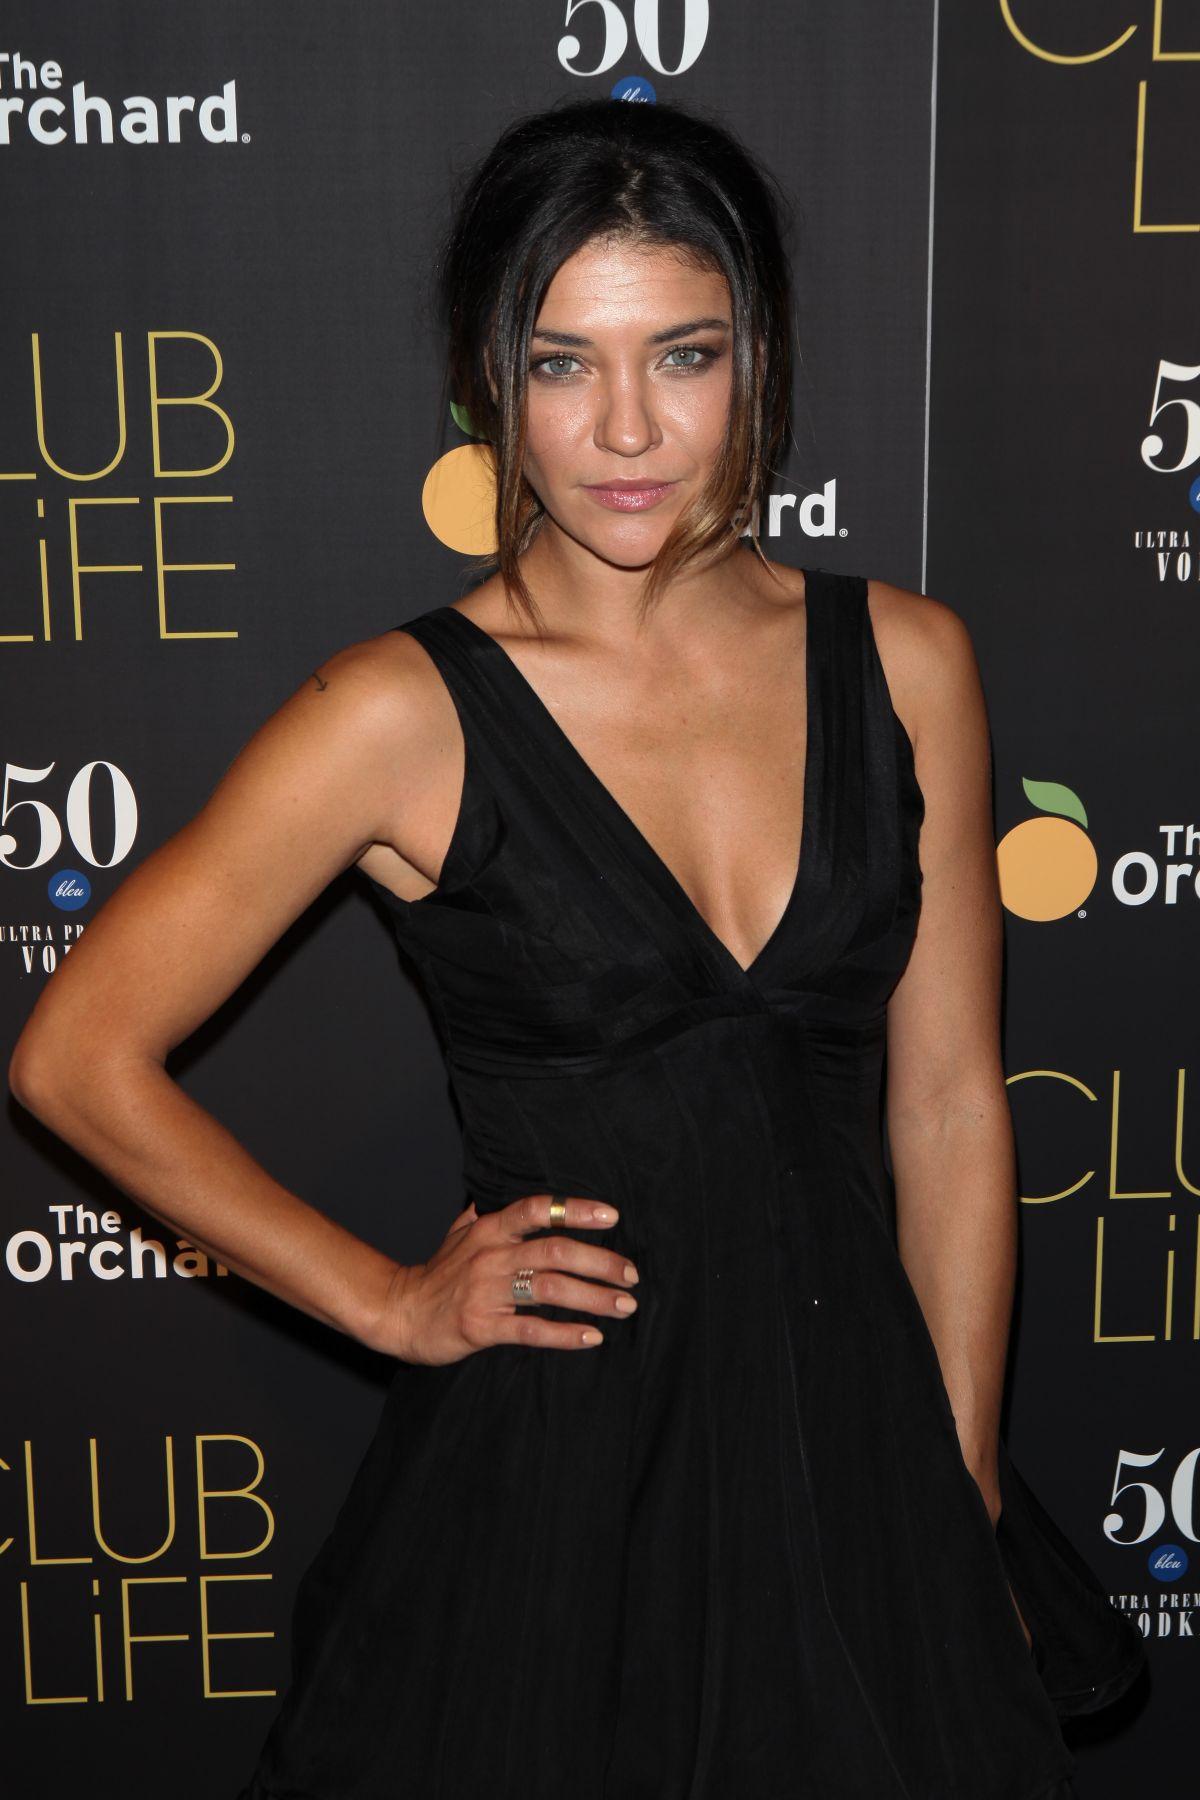 JESSICA SZOHR at Club Life Premiere in New York